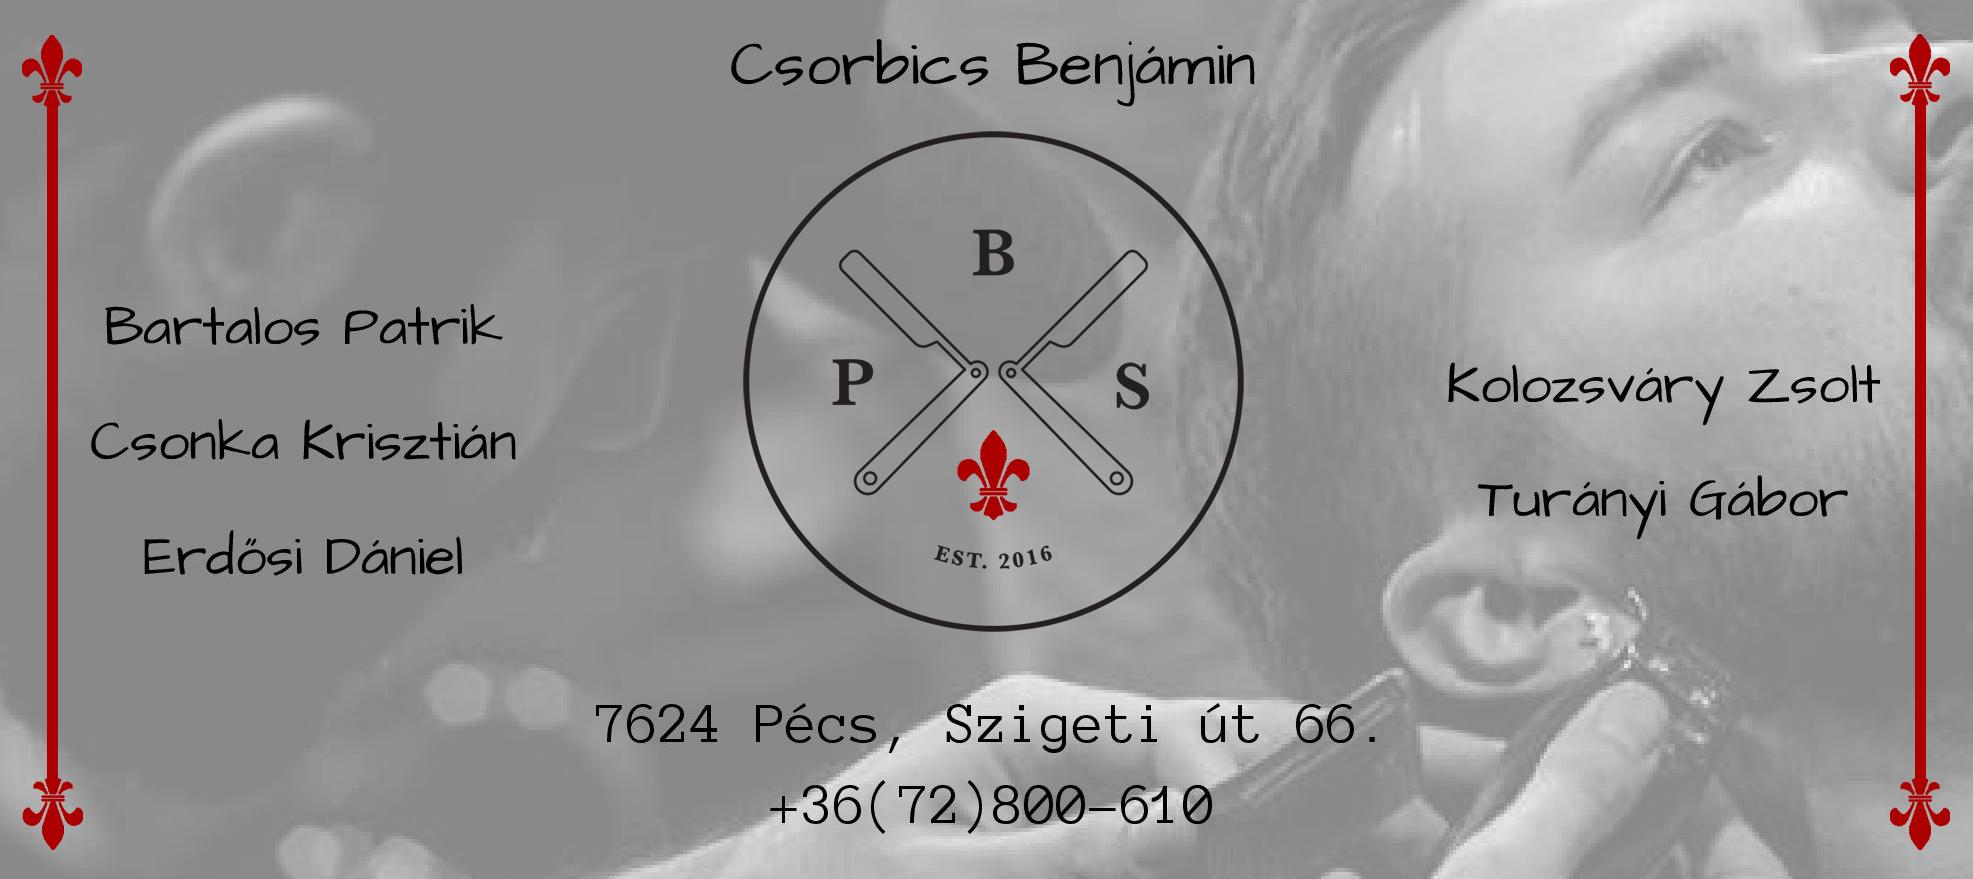 Pécs Barber Shop and Tattoo - Fodrászat